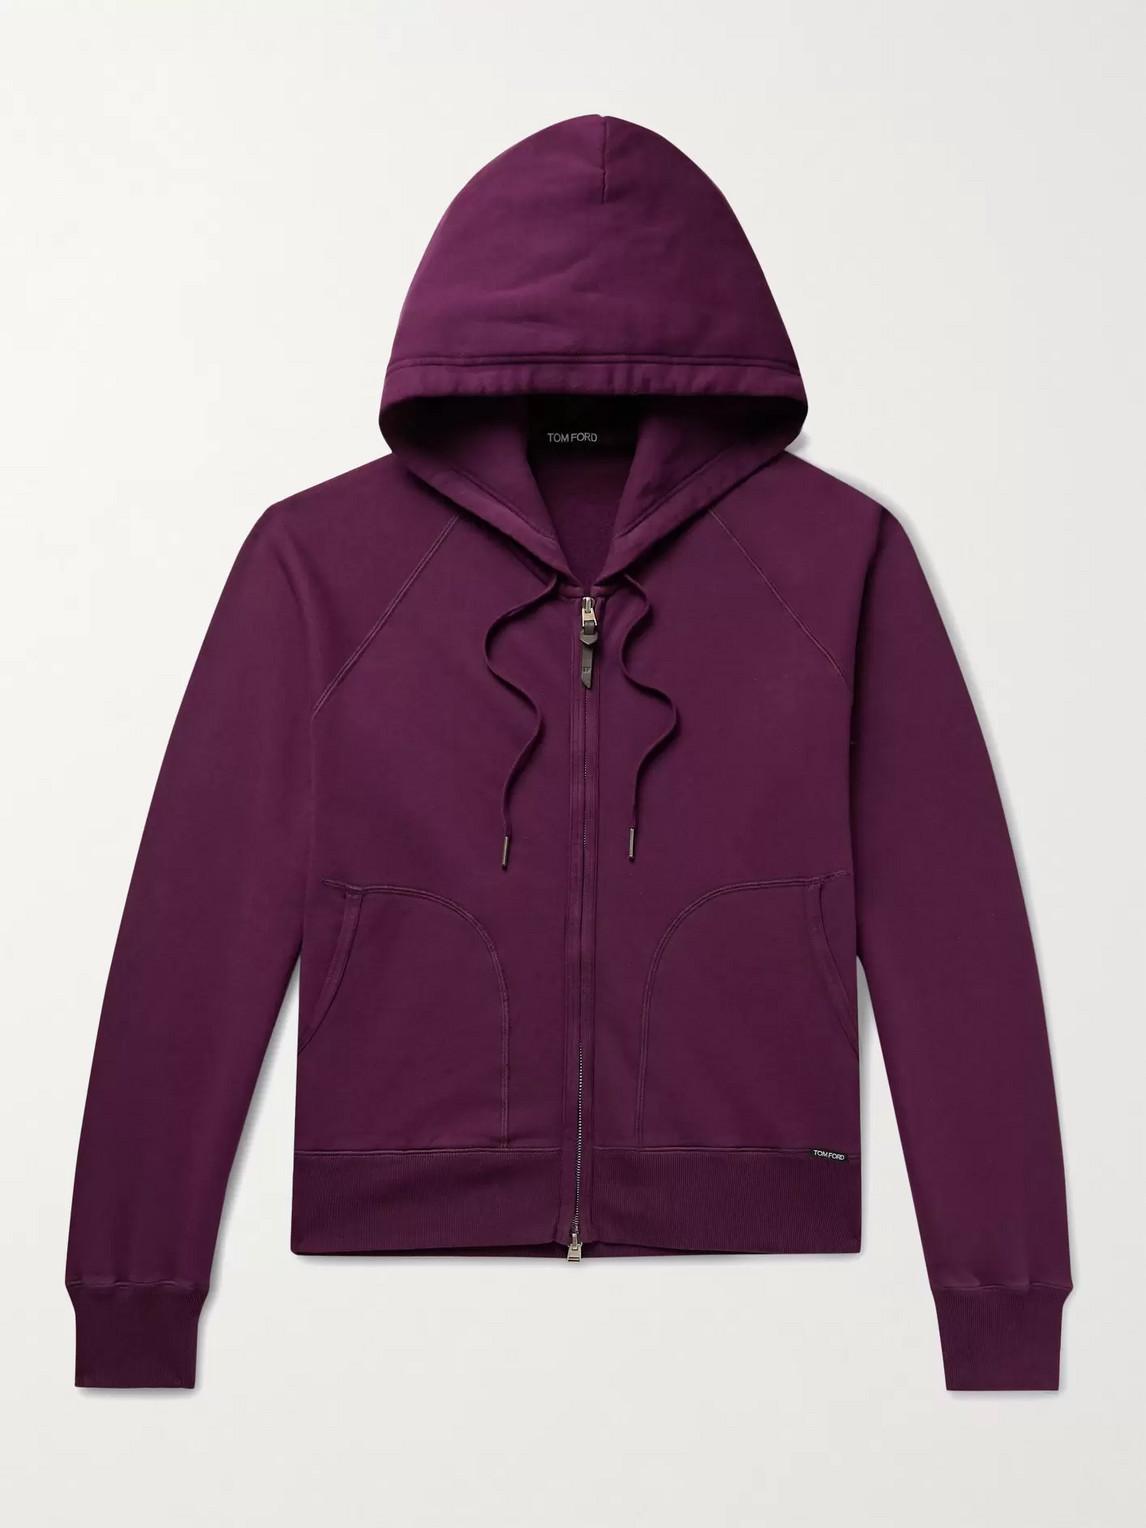 Tom Ford Fleece-back Cotton-jersey Zip-up Hoodie In Purple